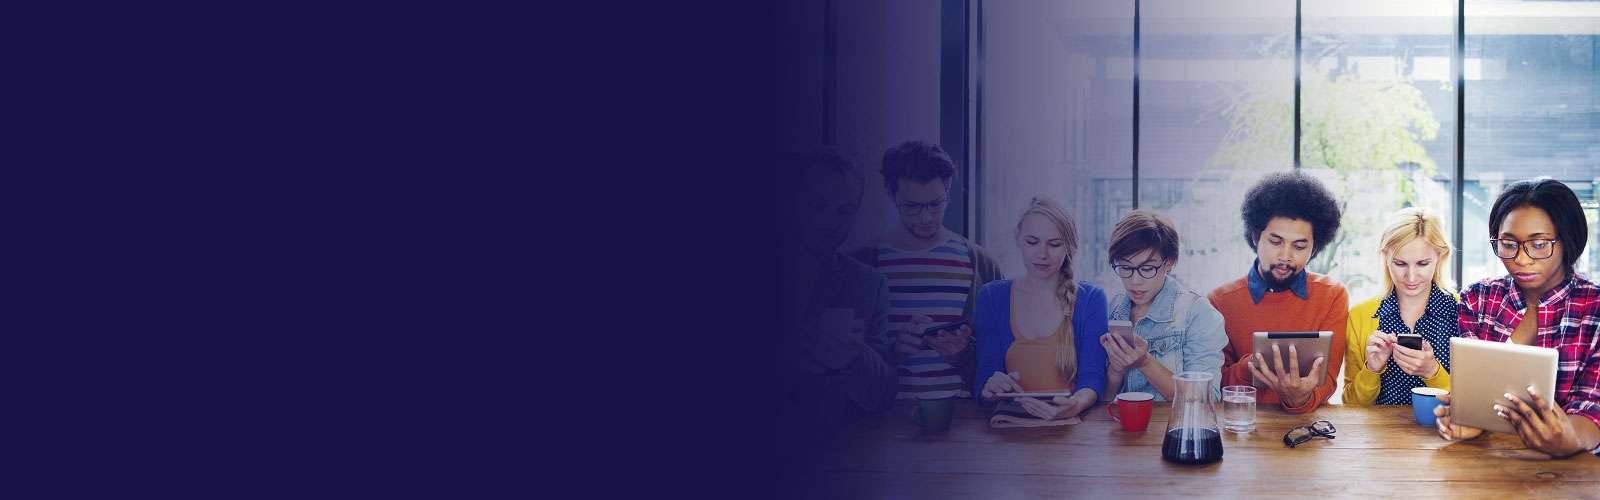 Nonprofit Digital Marketing Trends for 2021